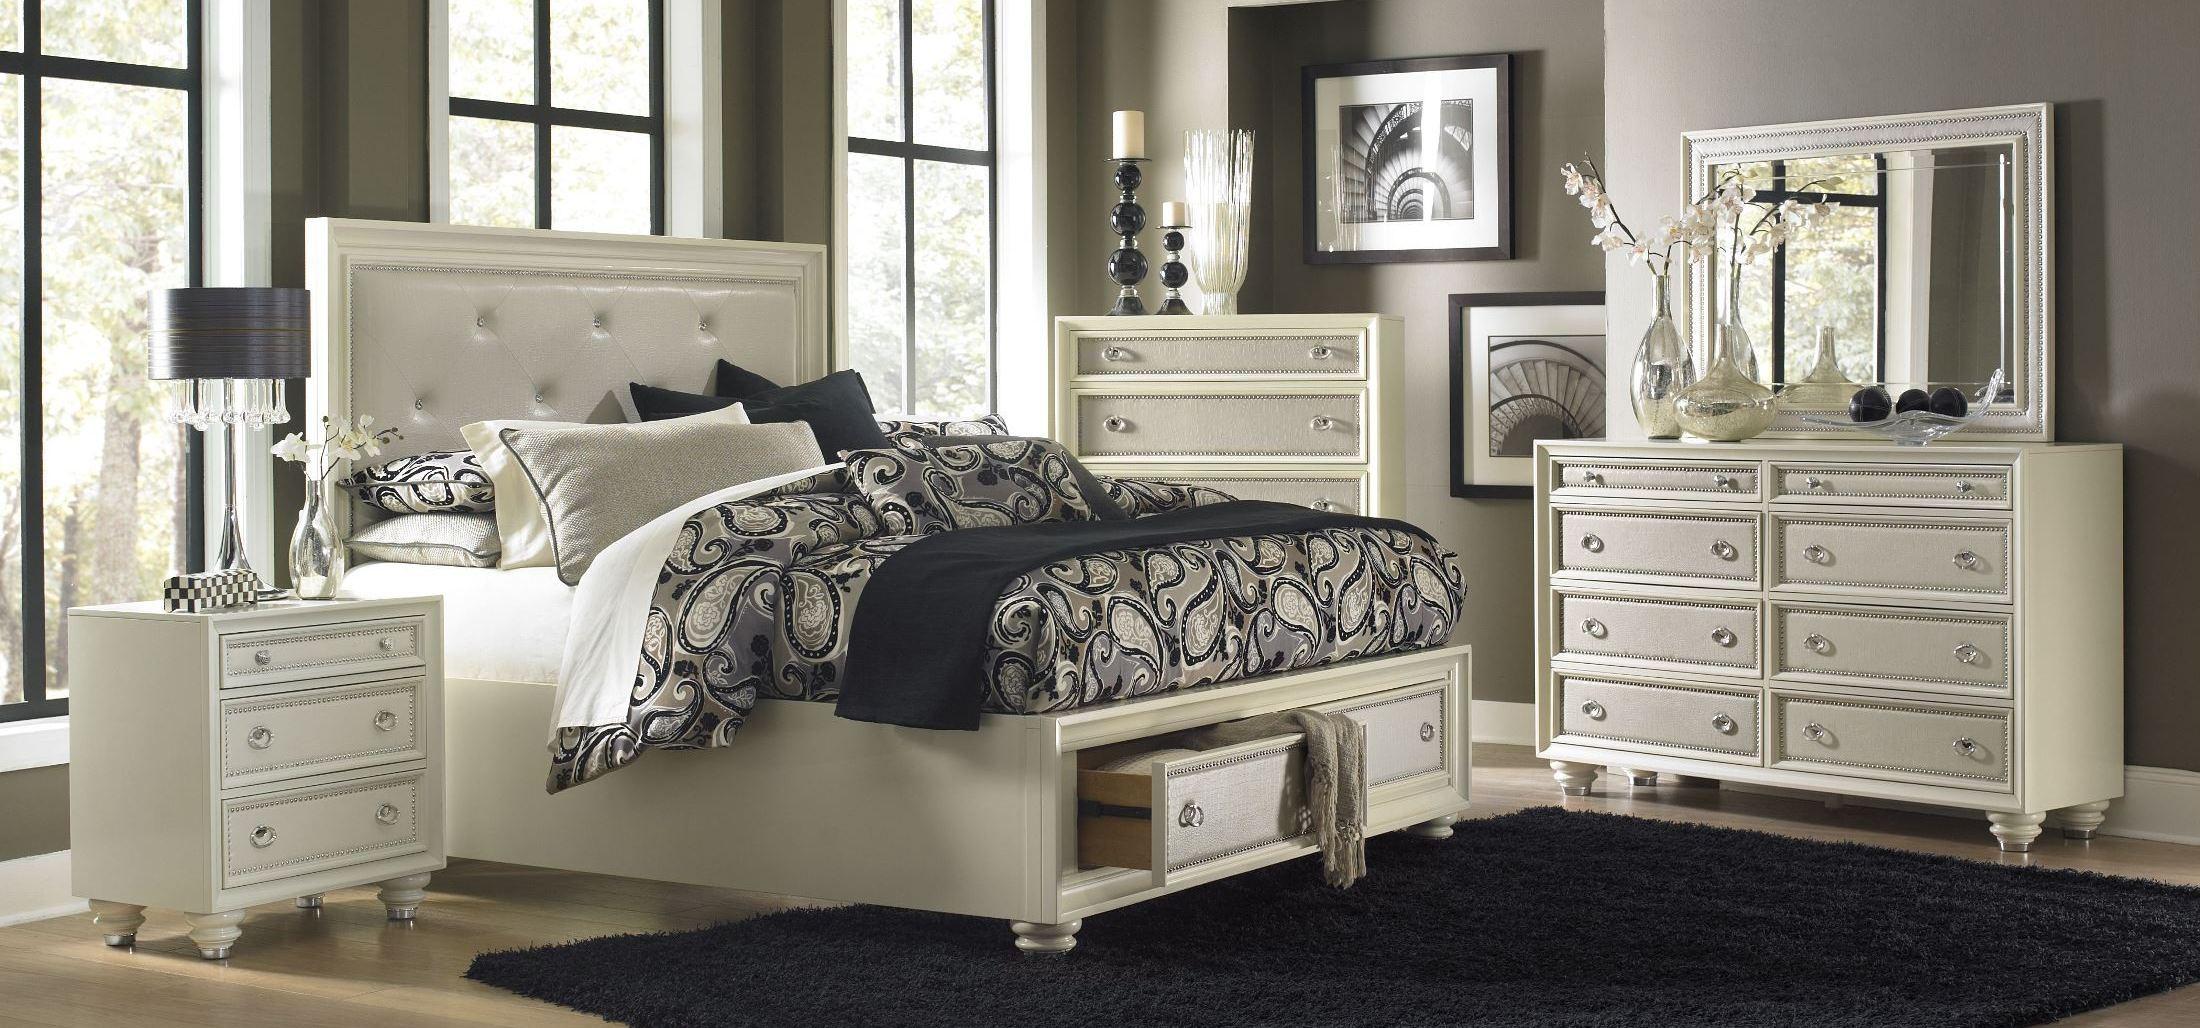 diamond island storage bedroom set from magnussen home